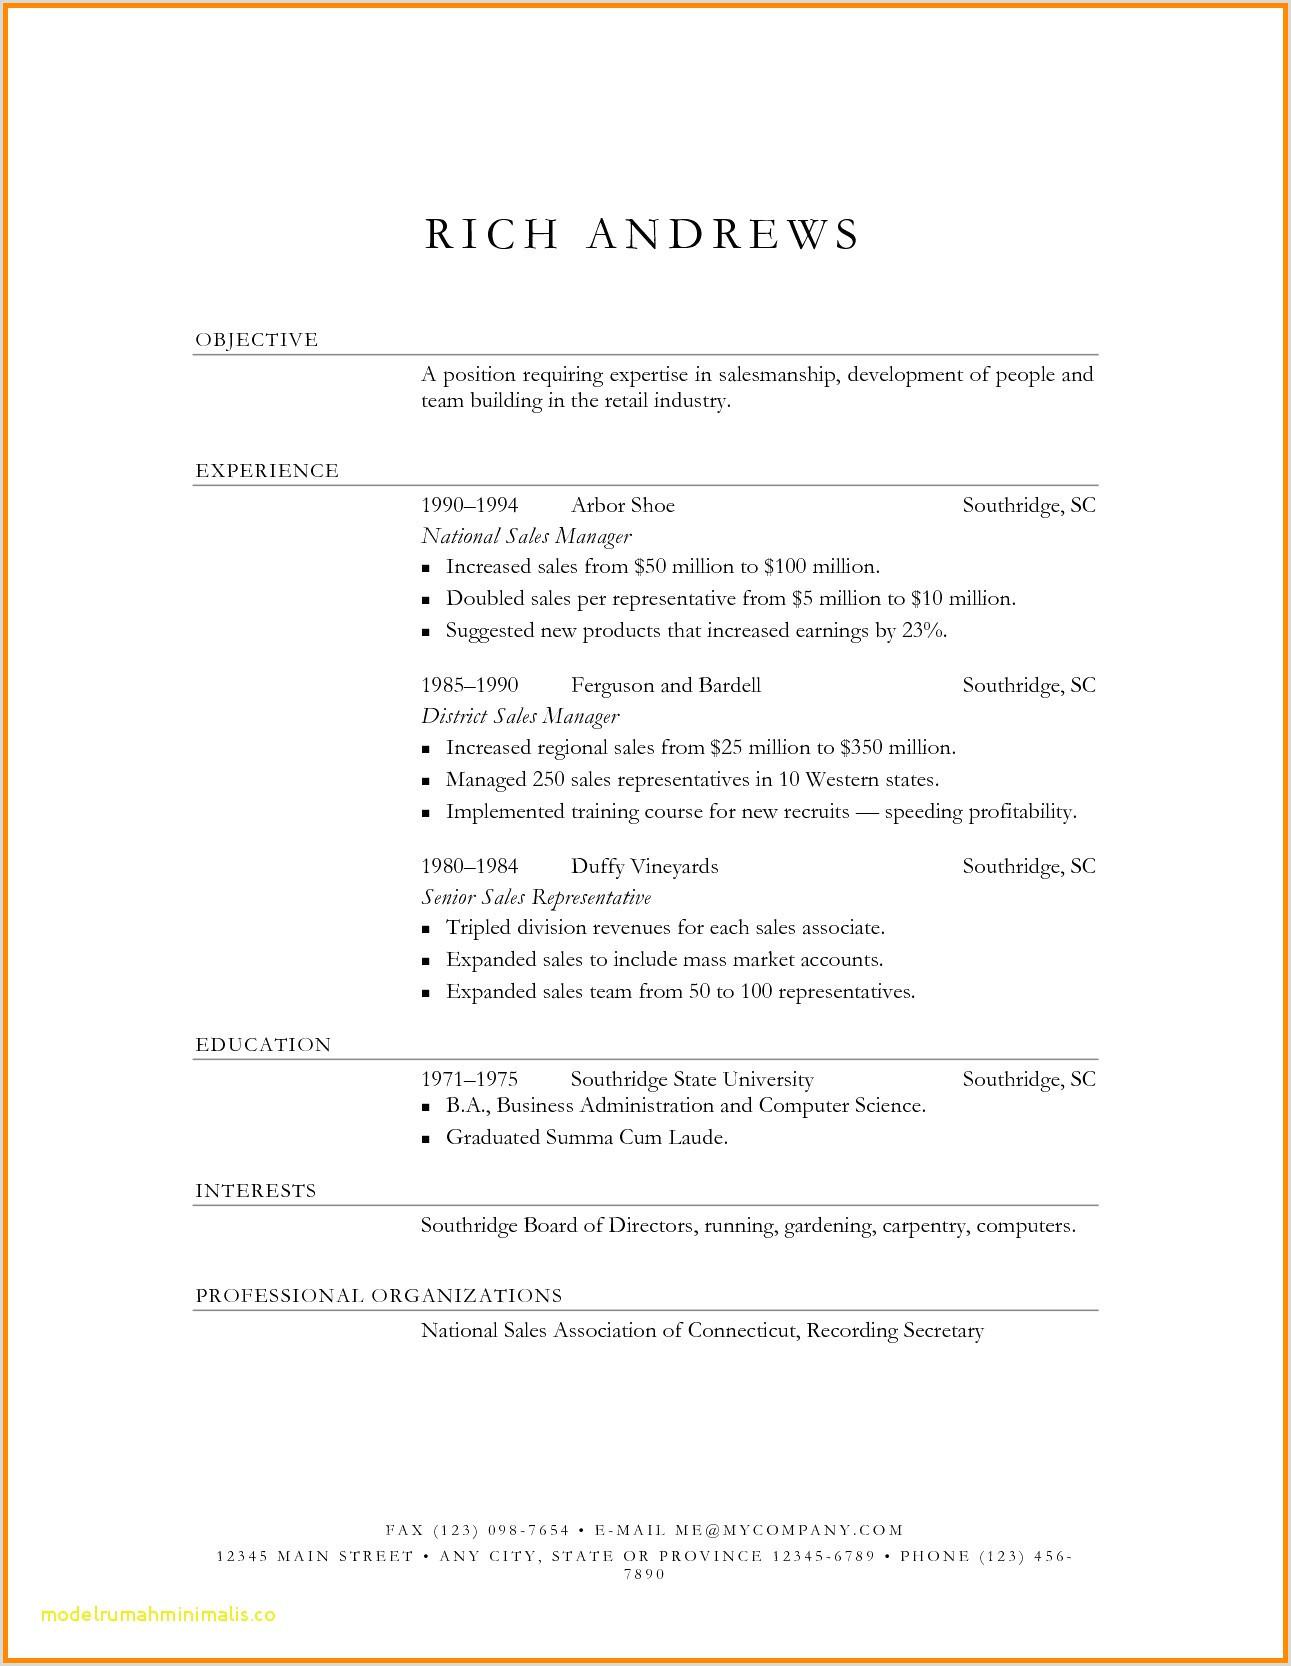 Professional Cv format for Procurement Officer Purchase Resume Templates Professional Unique Resume